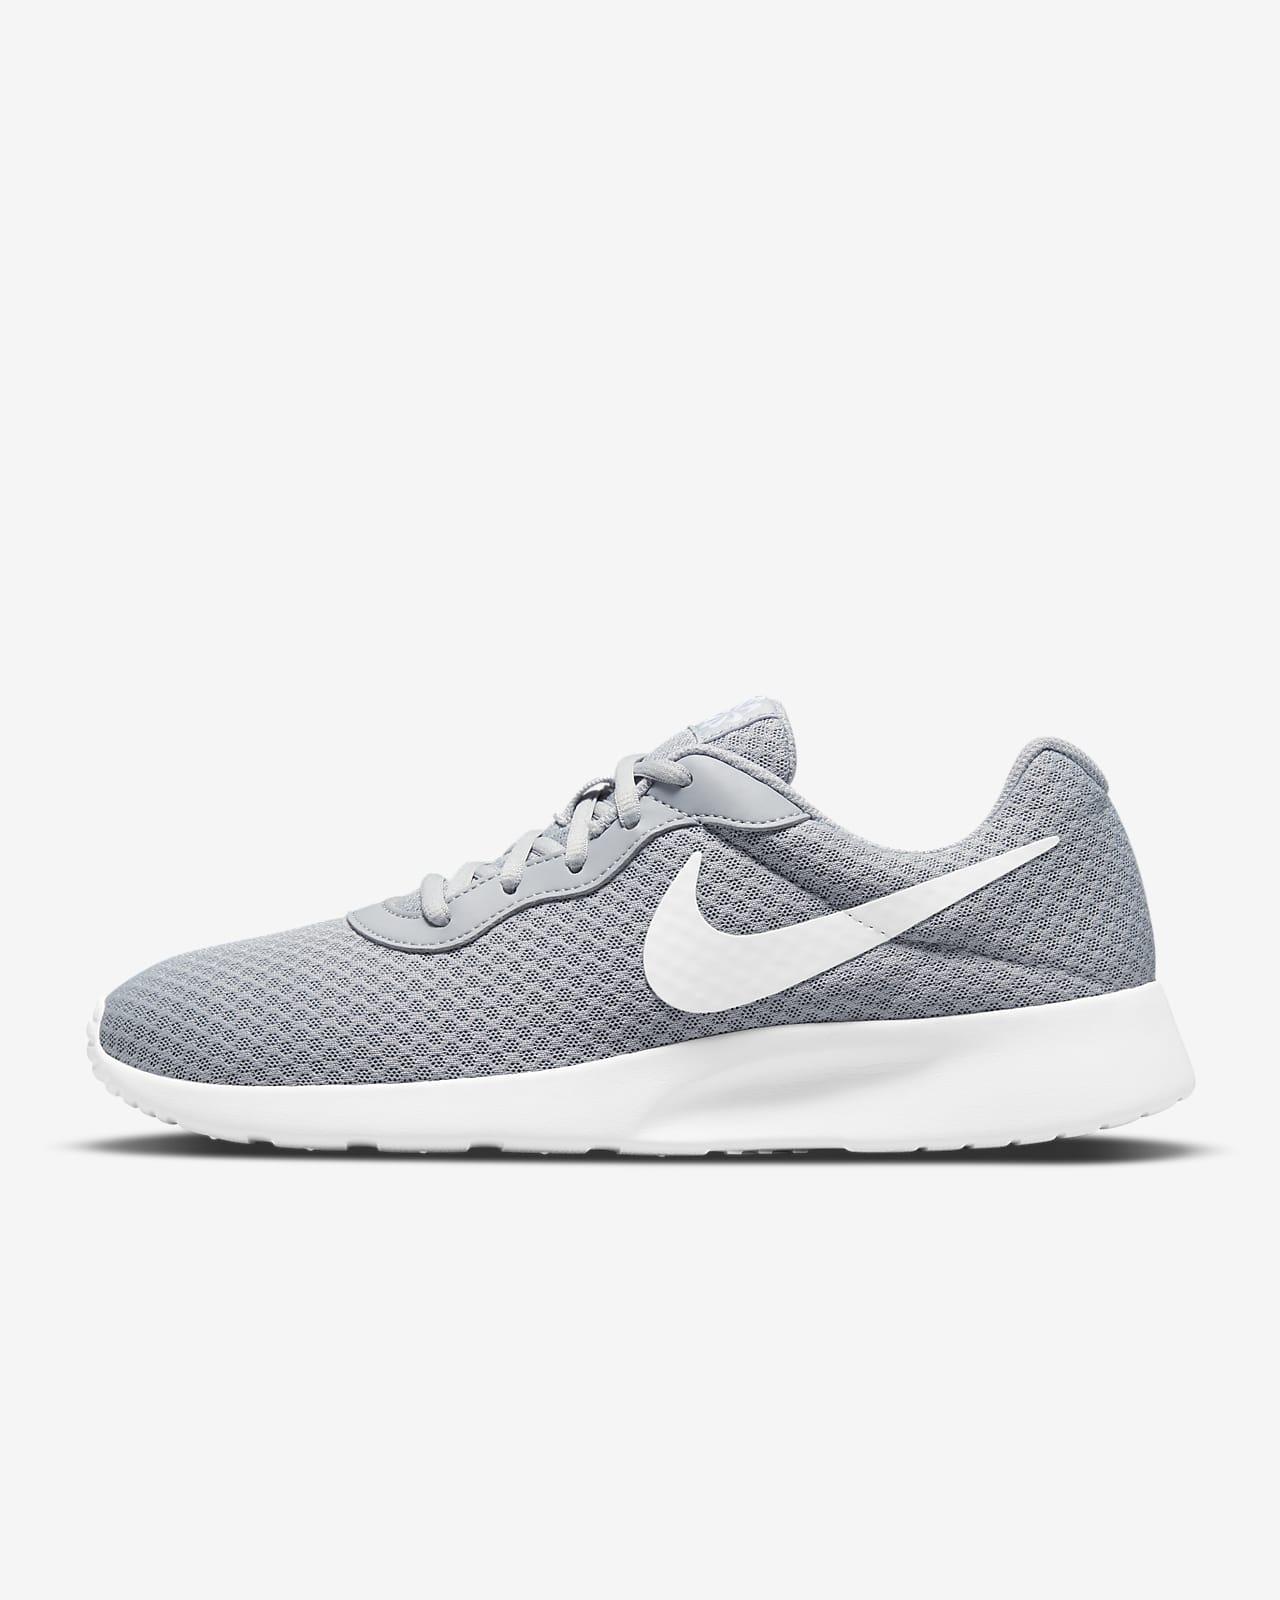 Chaussures Nike Tanjun pour Homme. Nike LU